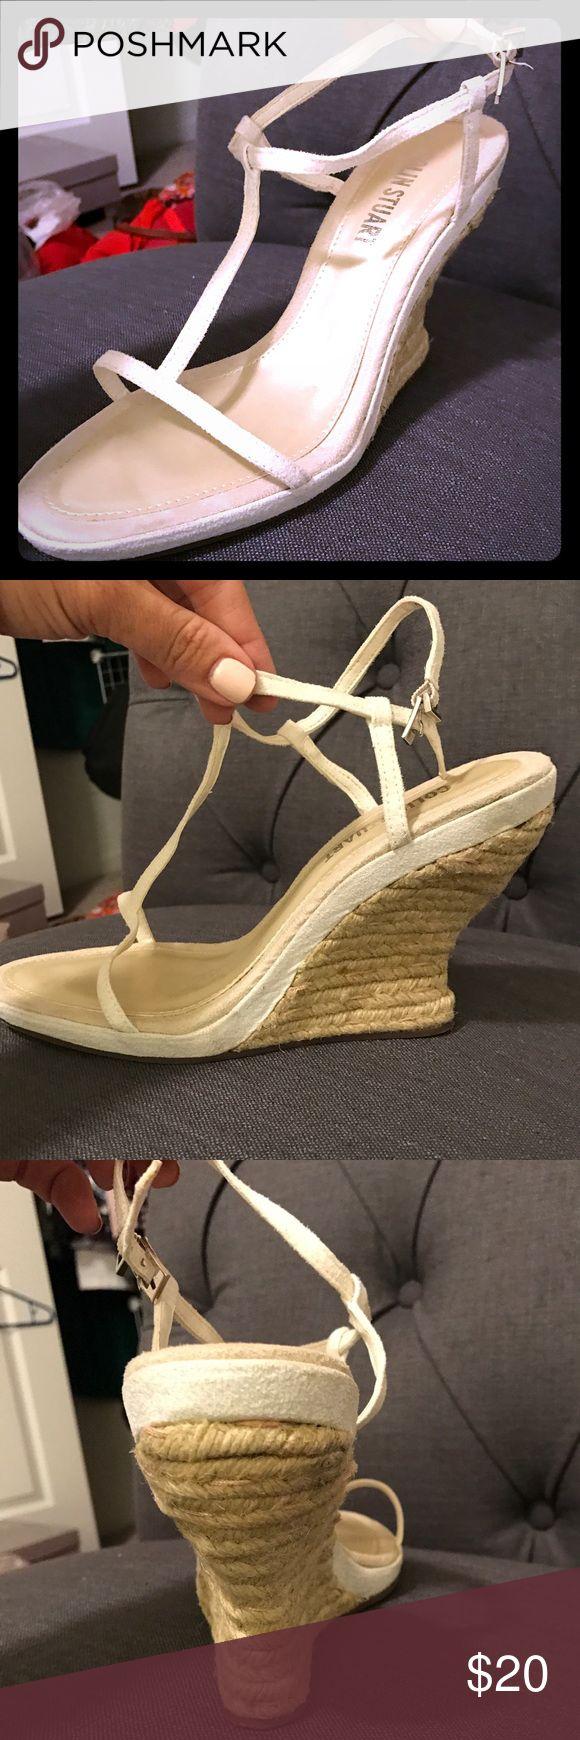 "Colin Stuart leather T strap espadrilles Colin Stuart white leather T strap espadrilles; wedge. 3"" heel. Very cute, only worn once! Comes in original box. Colin Stuart Shoes Espadrilles"